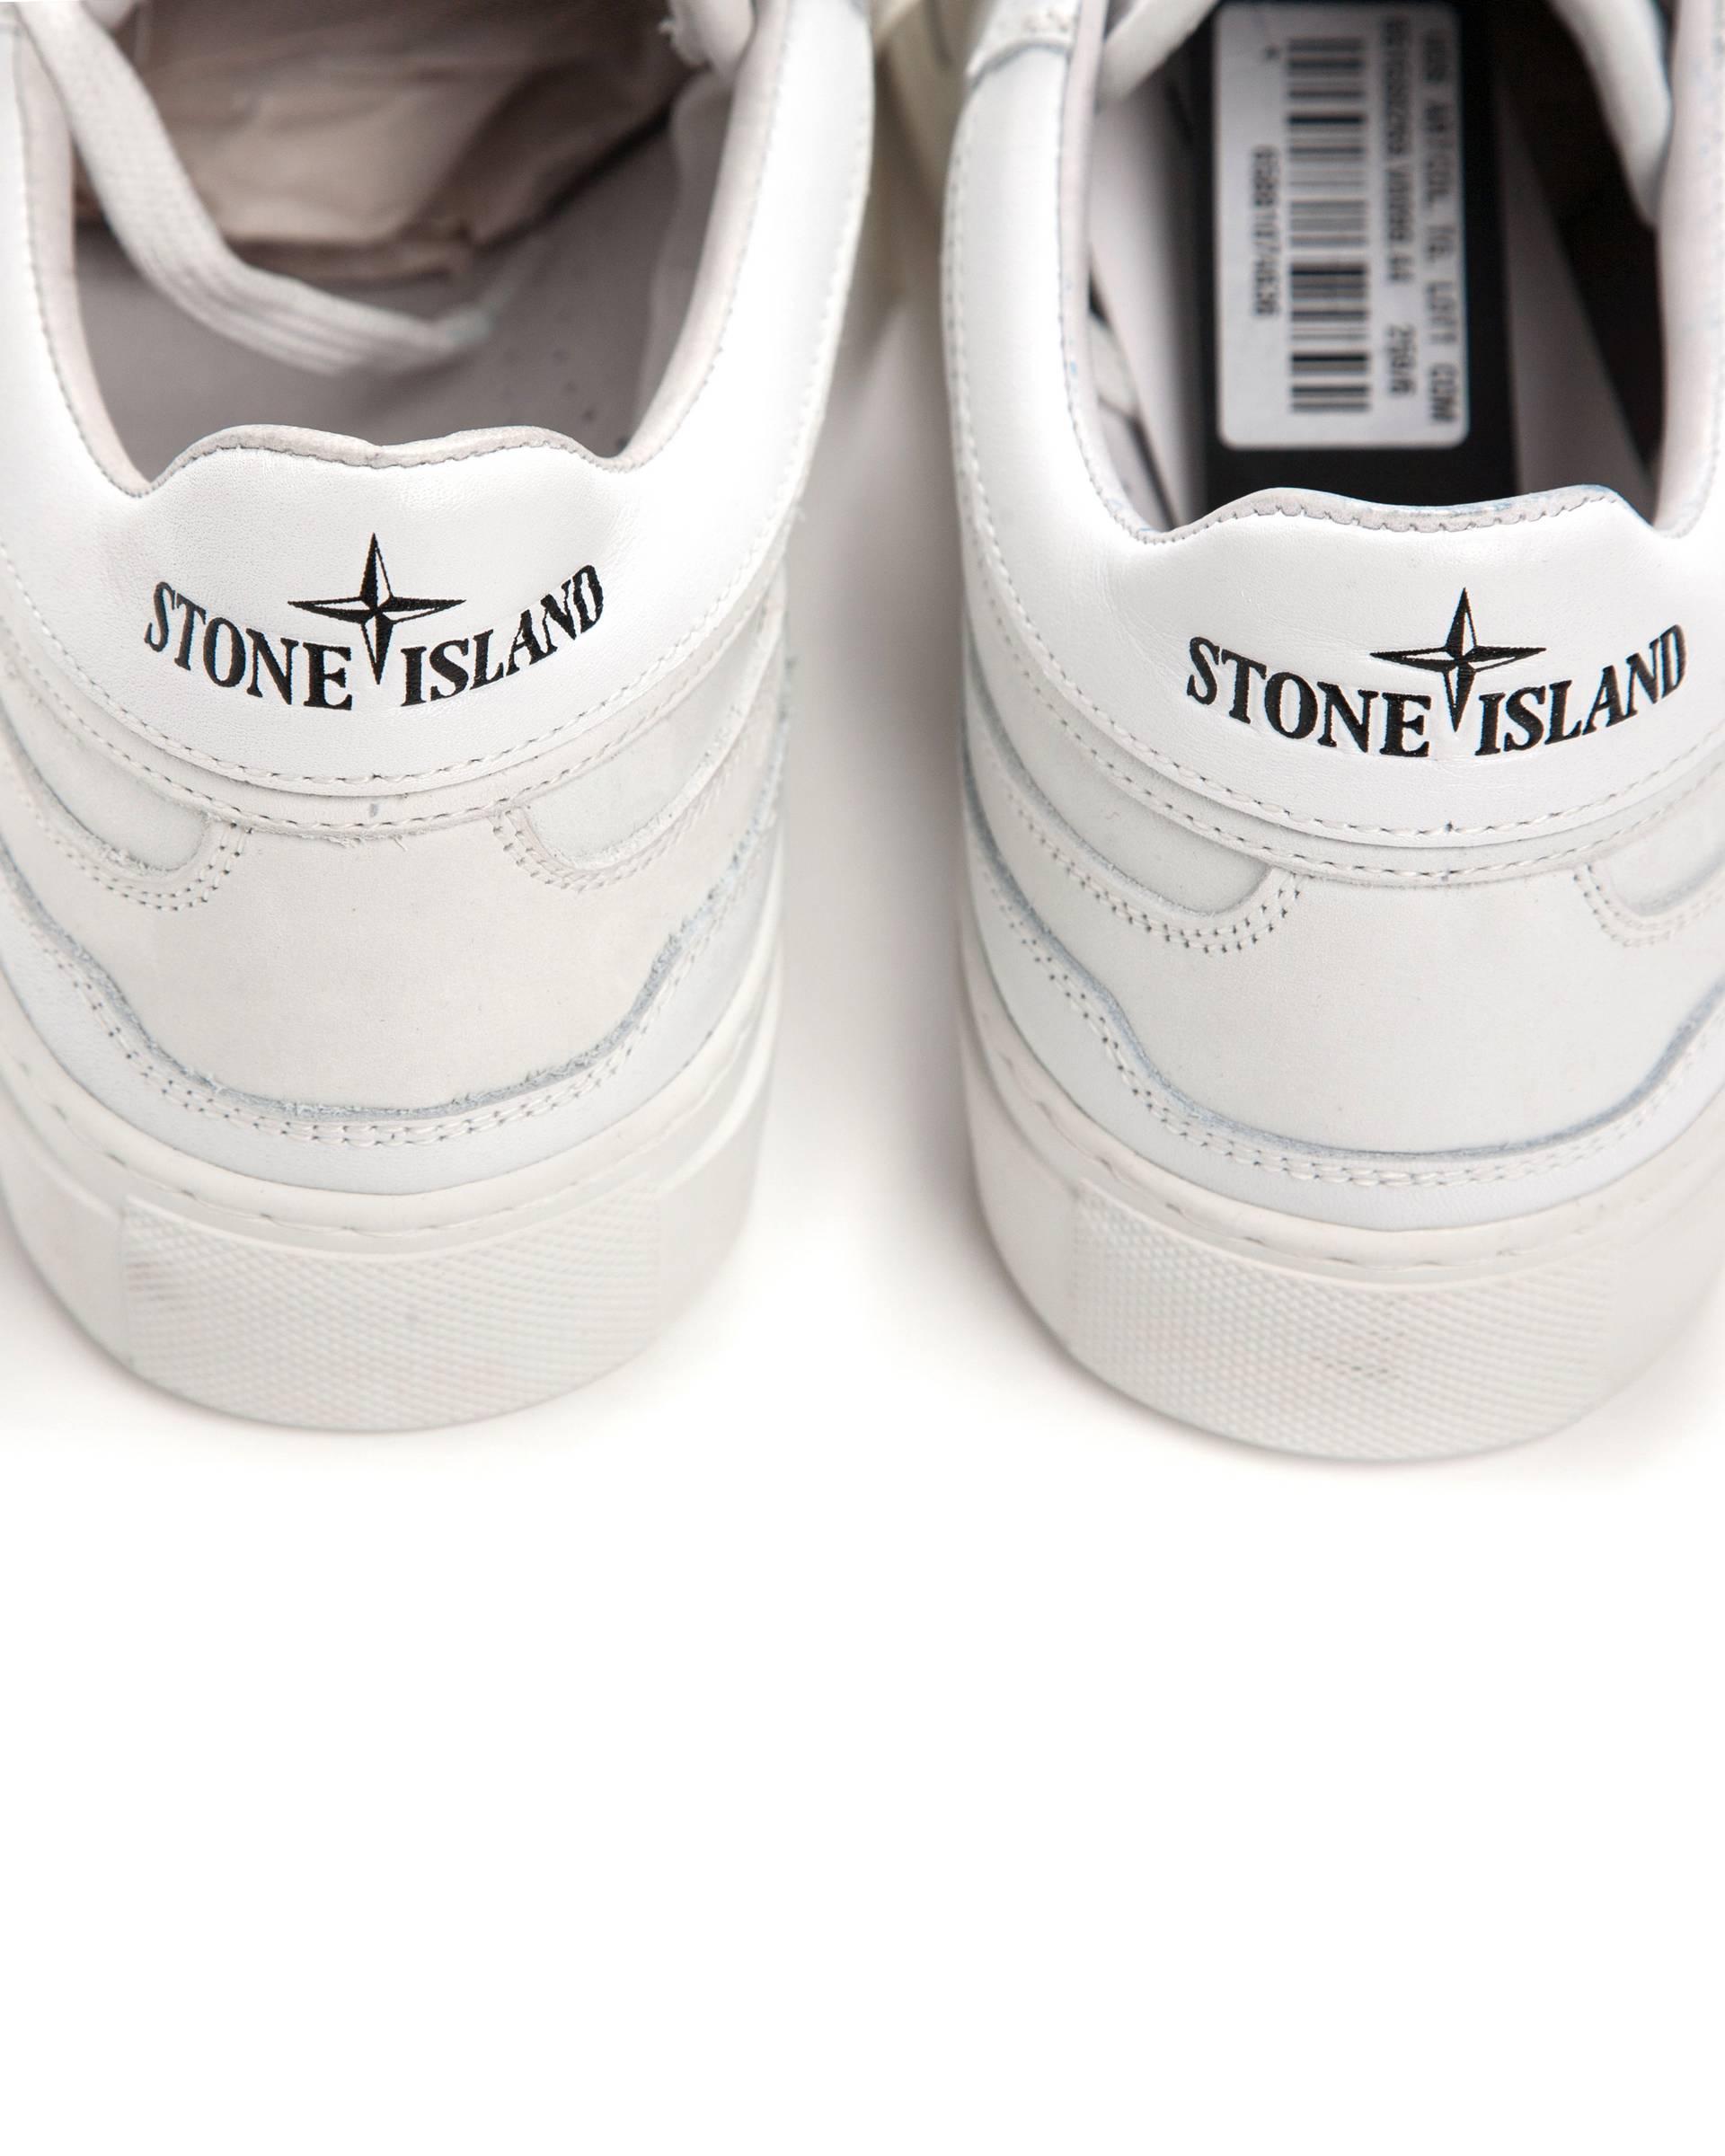 Кеды Stone Island x Diemme Белые кожаные